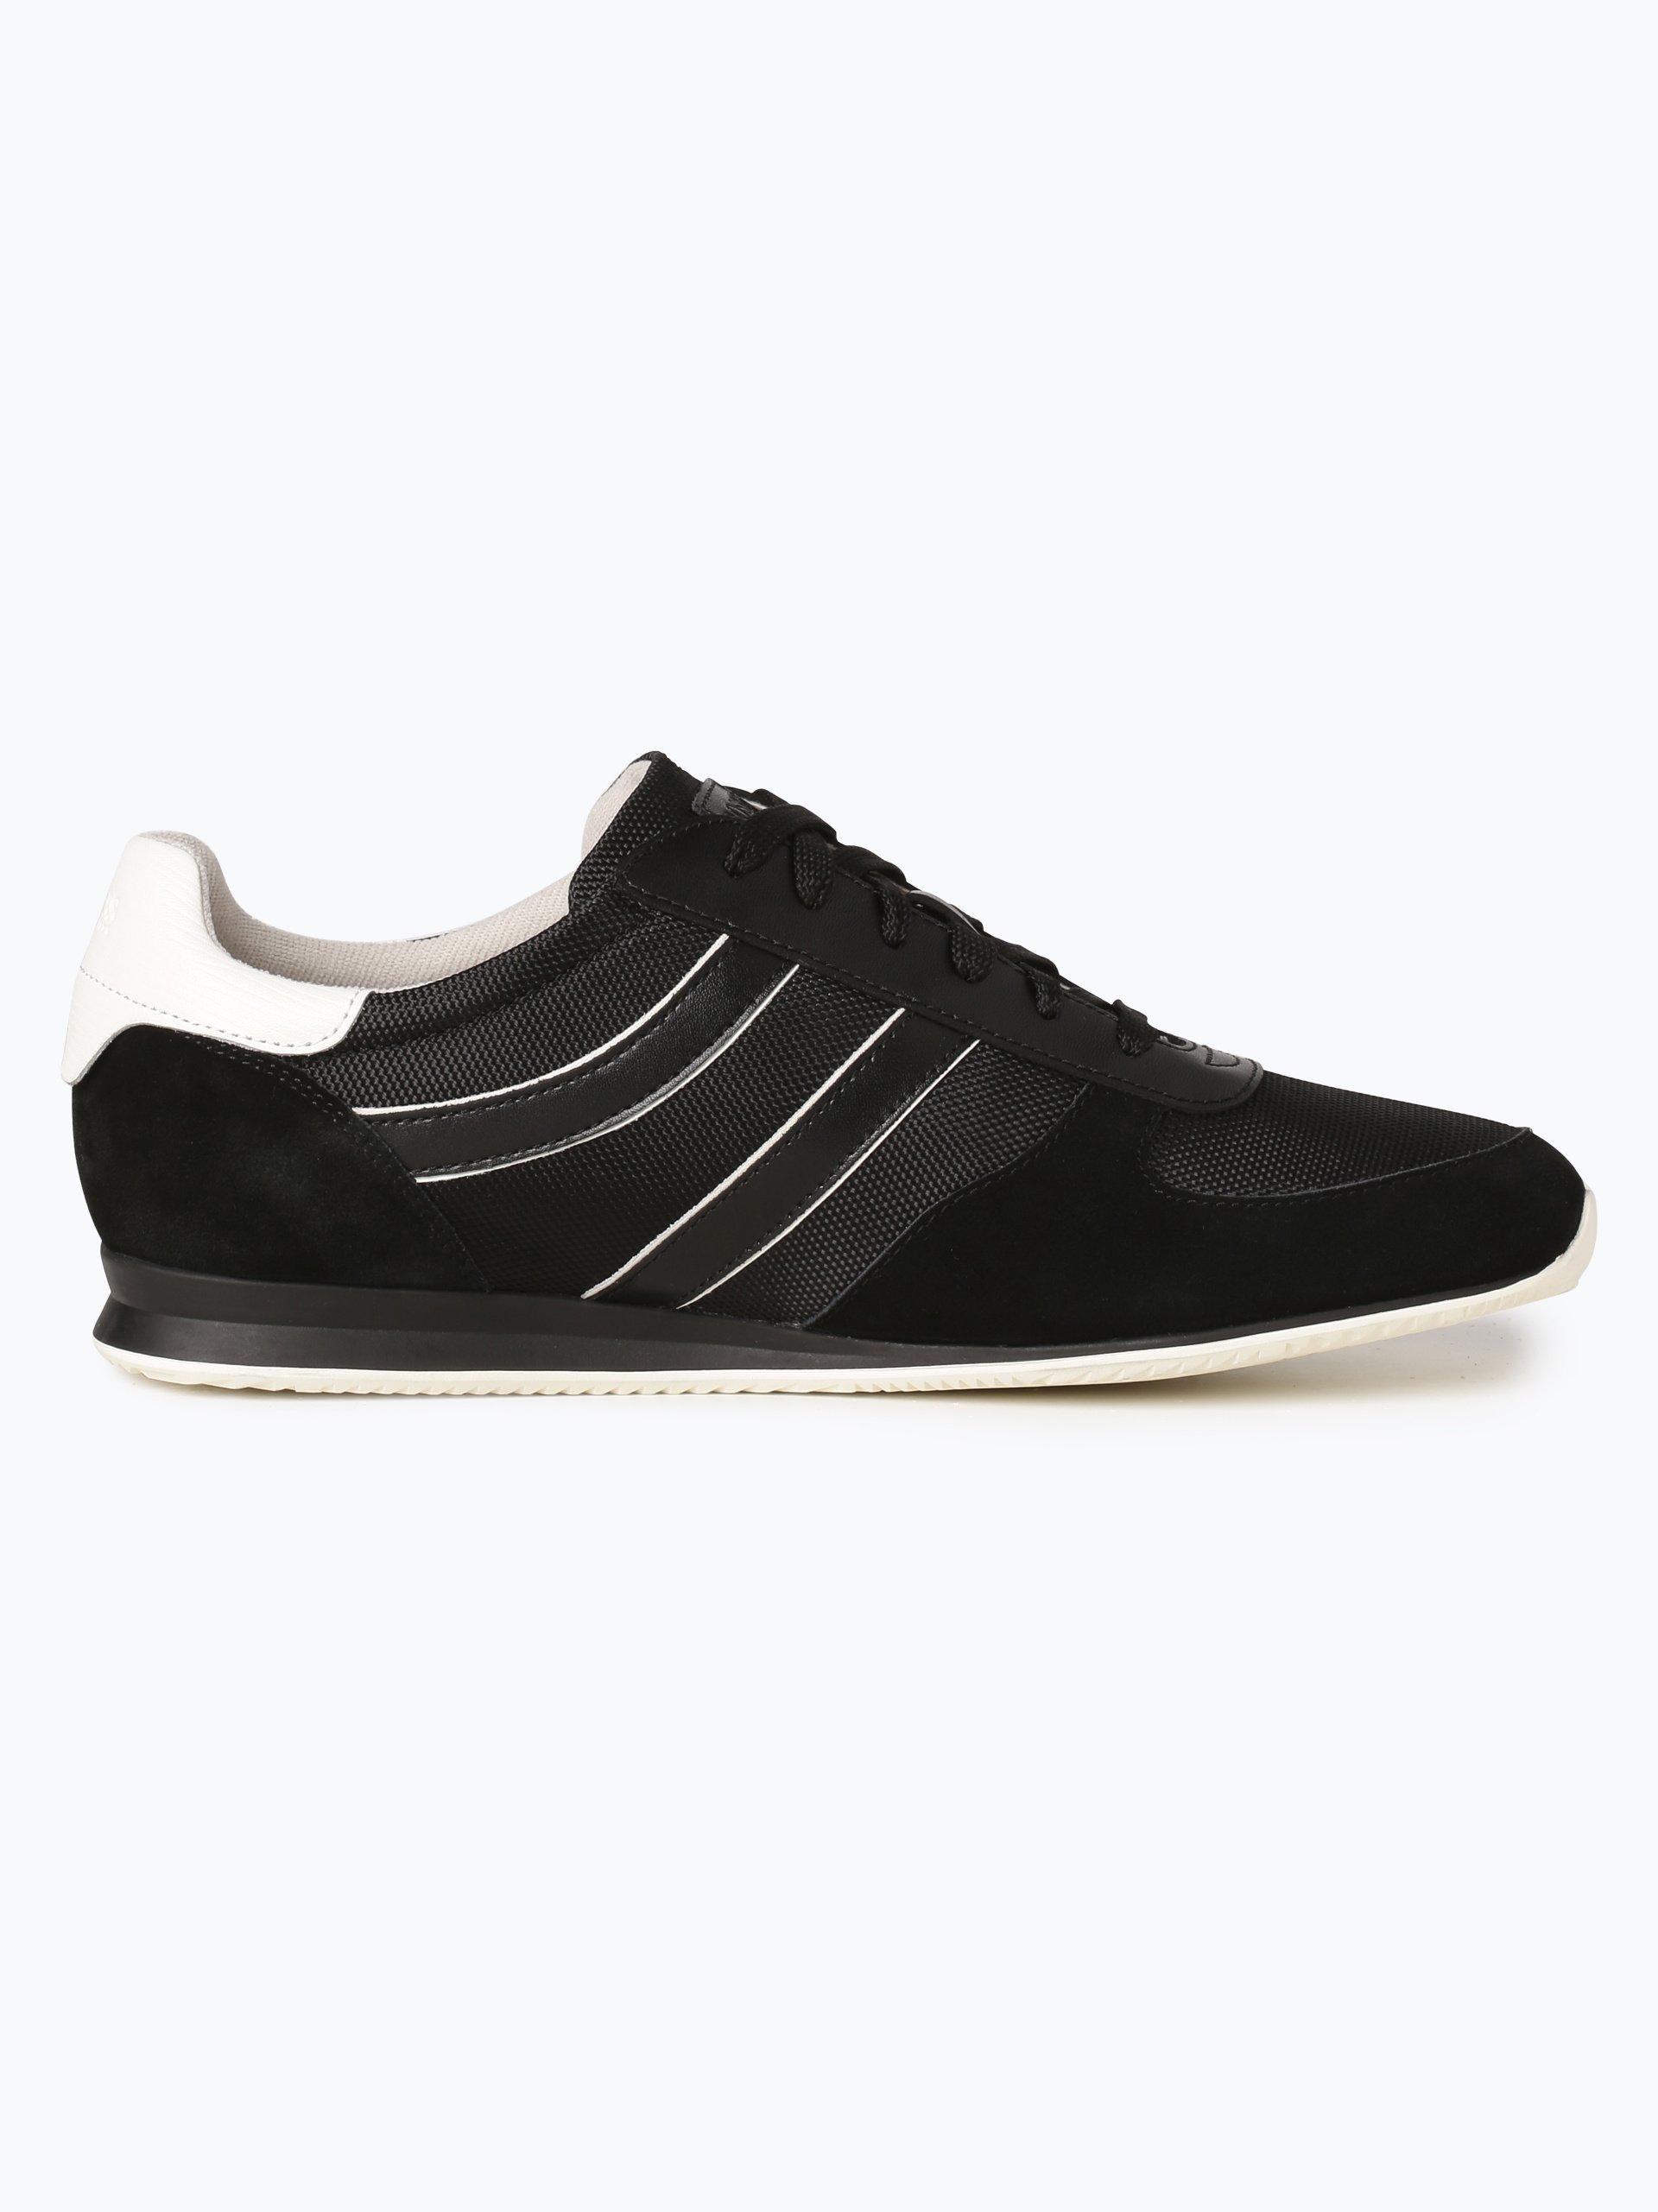 BOSS Casual Herren Sneaker mit Leder-Anteil - Orland_Lowp_ny1